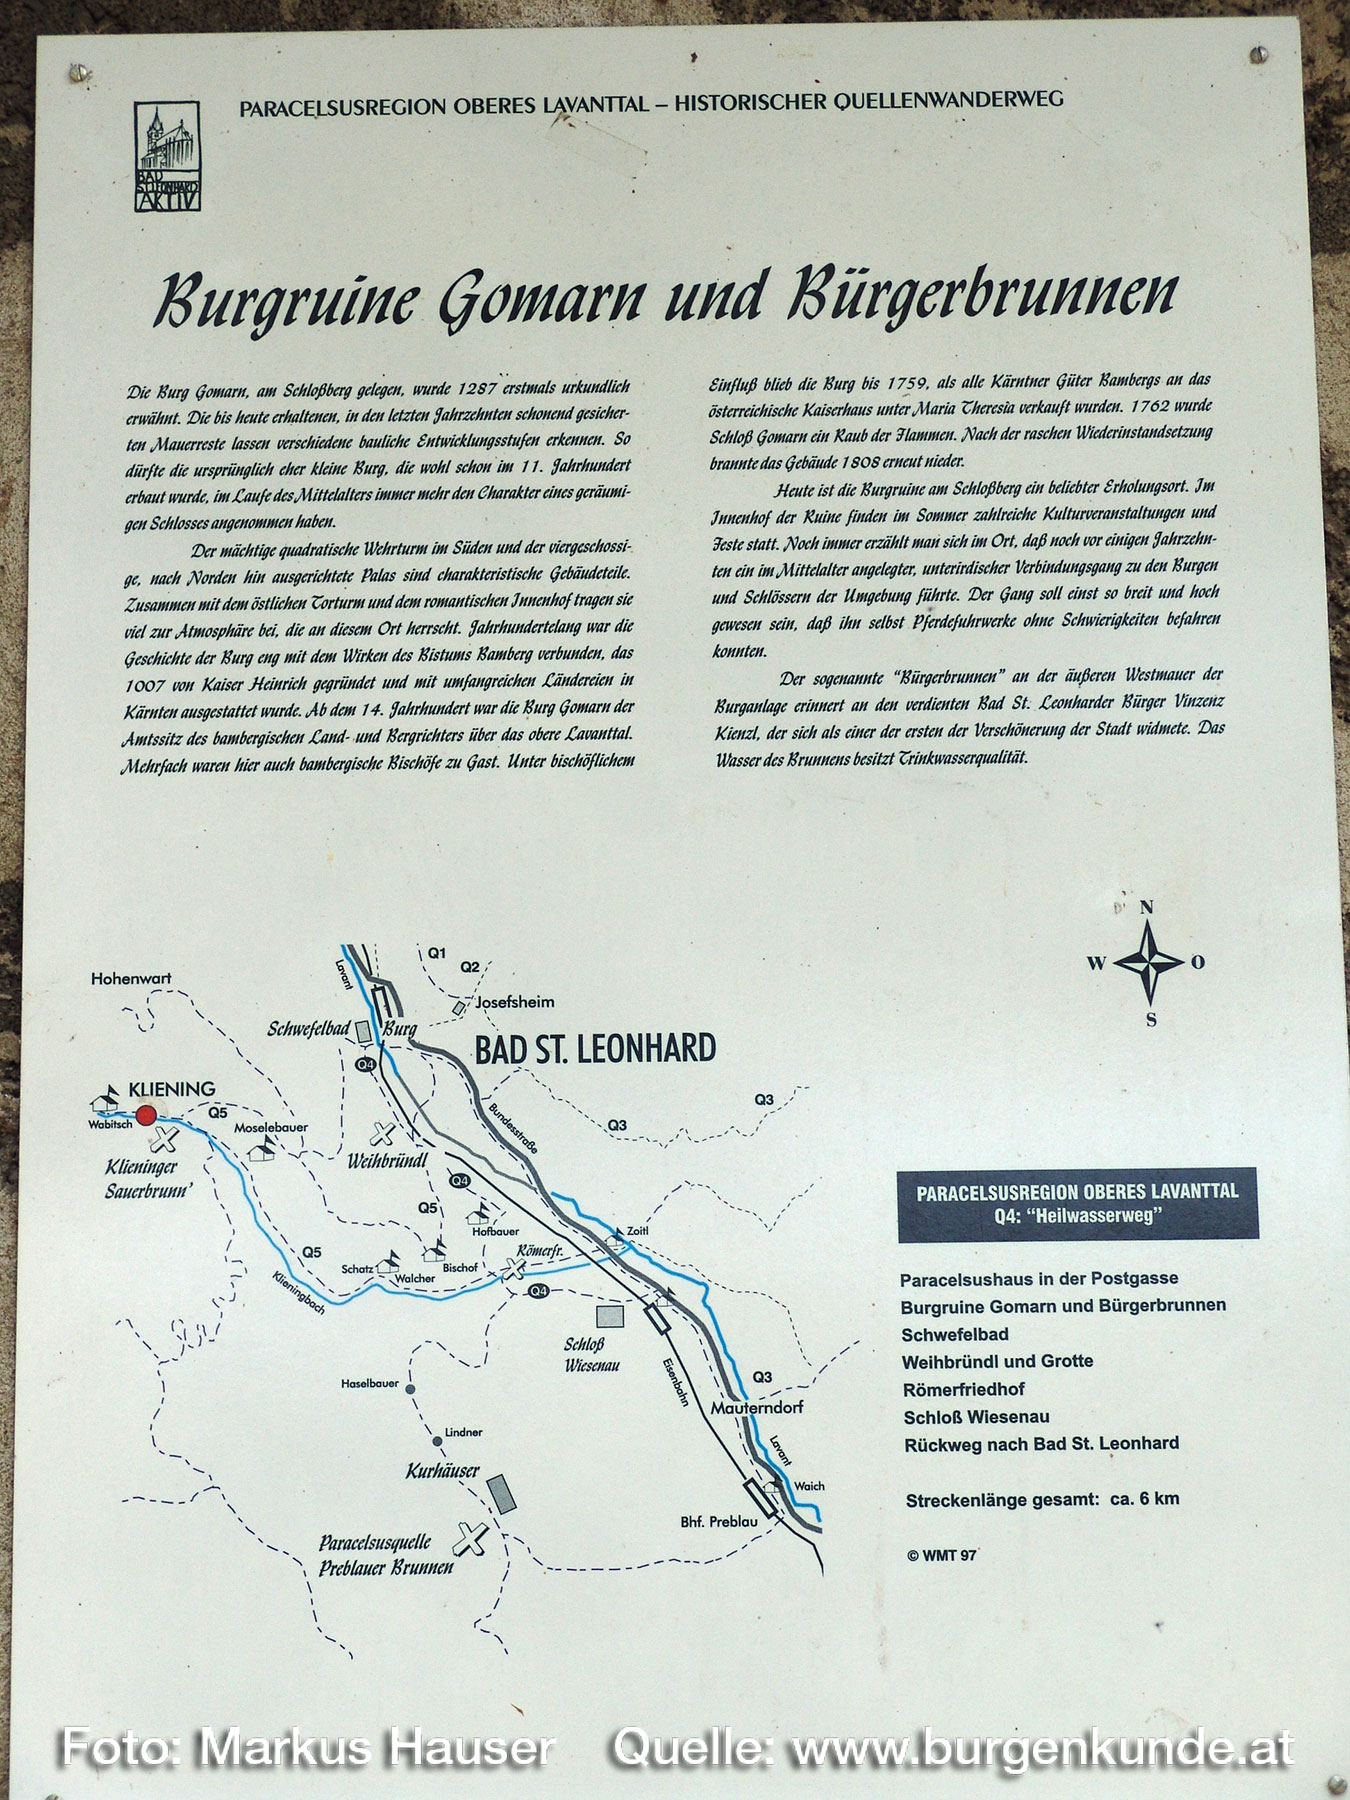 Burgruine-Gomarn-Bad-St-Leonhard-Kaernten-048